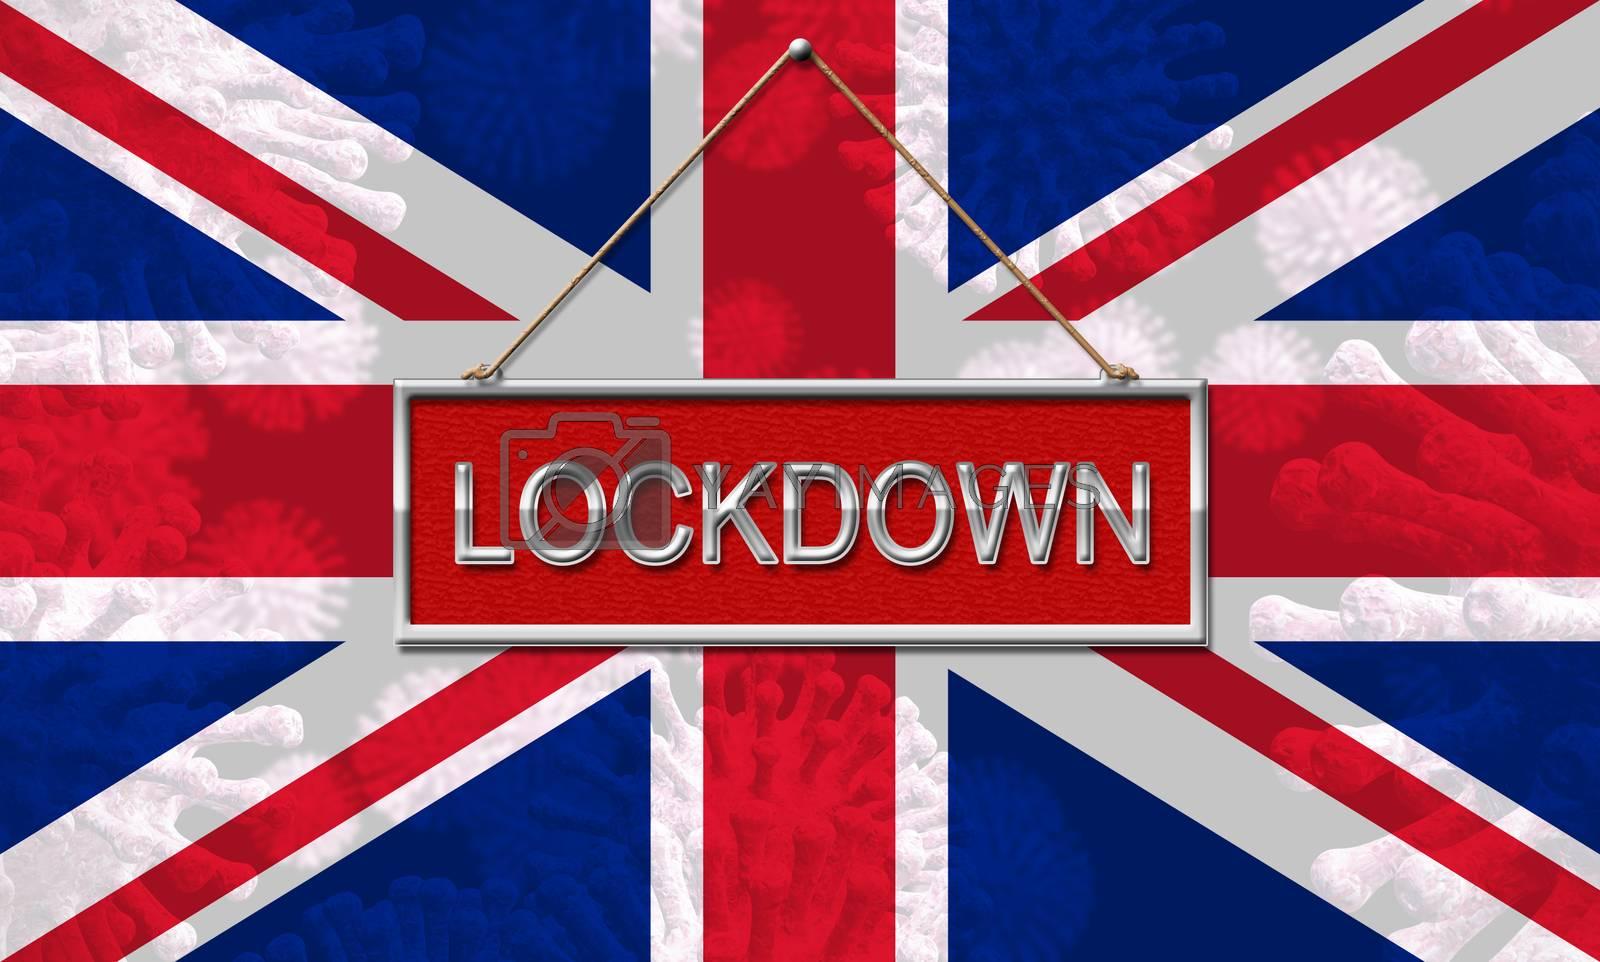 United Kingdom lockdown emergency preventing coronavirus spread  by stuartmiles